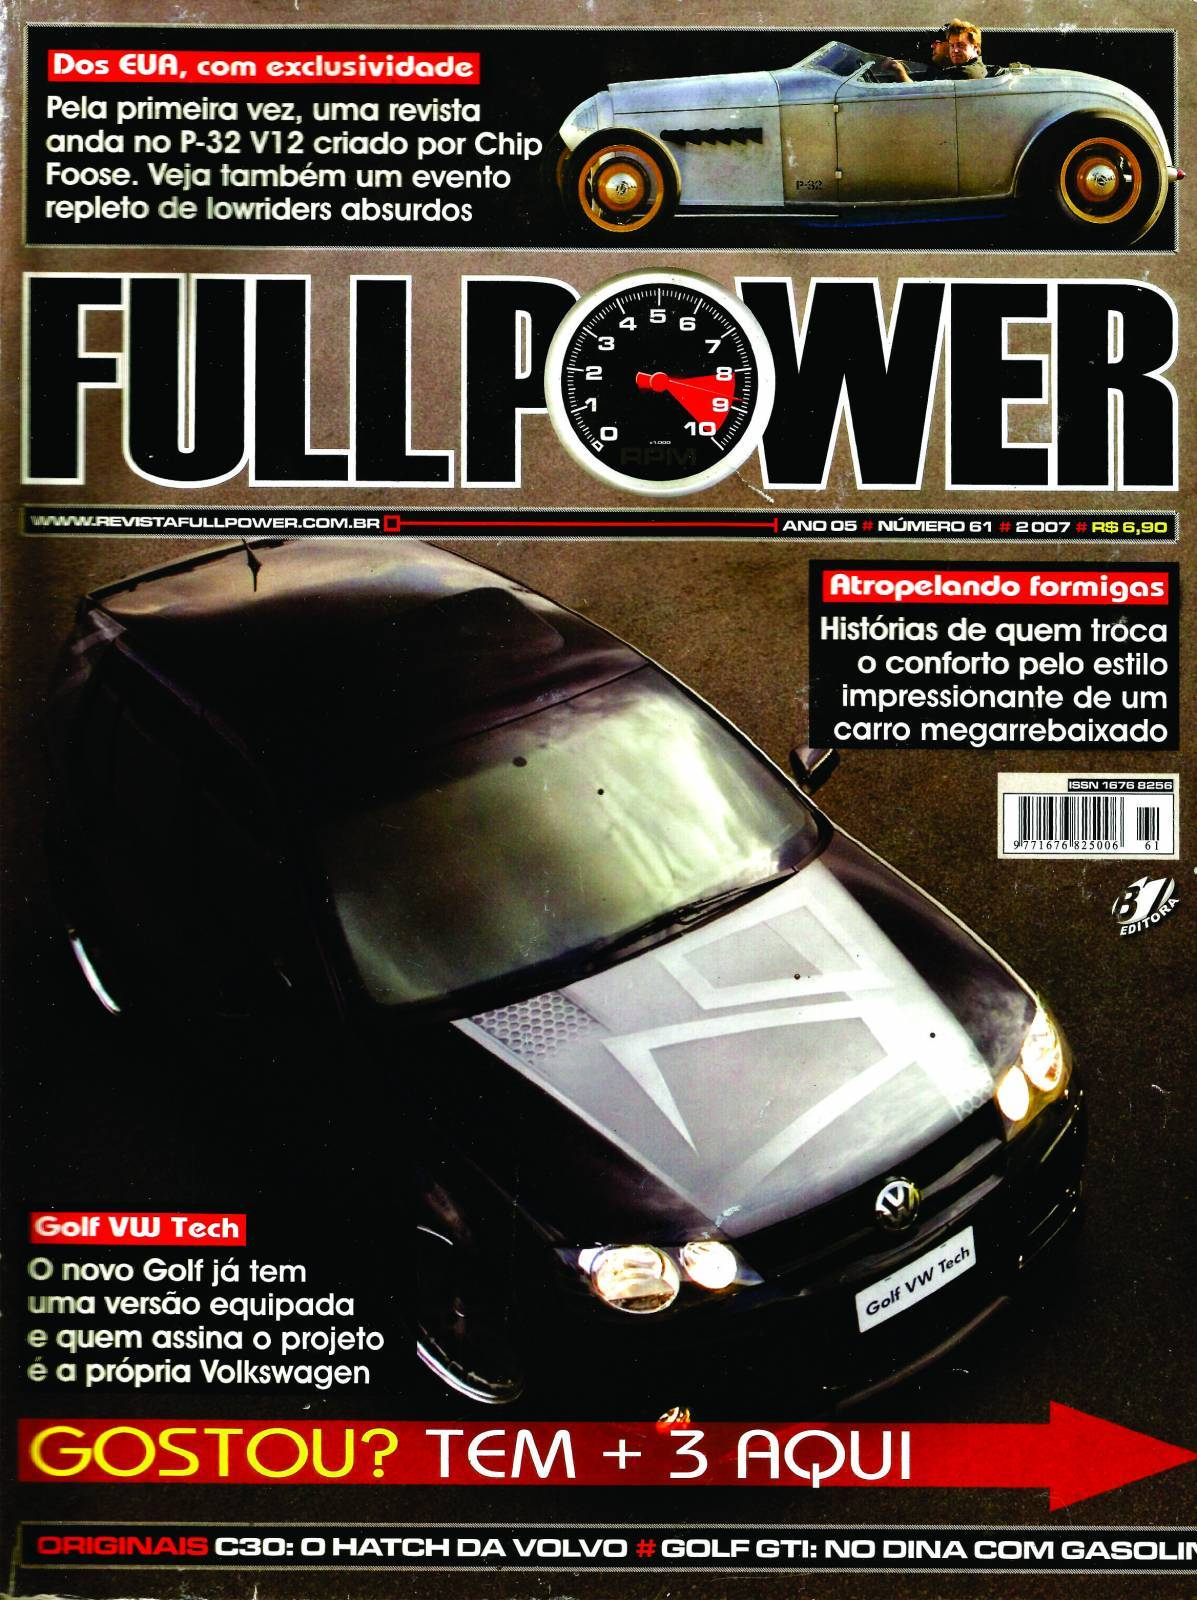 REVISTA FULLPOWER No. 61 ANO 2007 - Loja FullPower